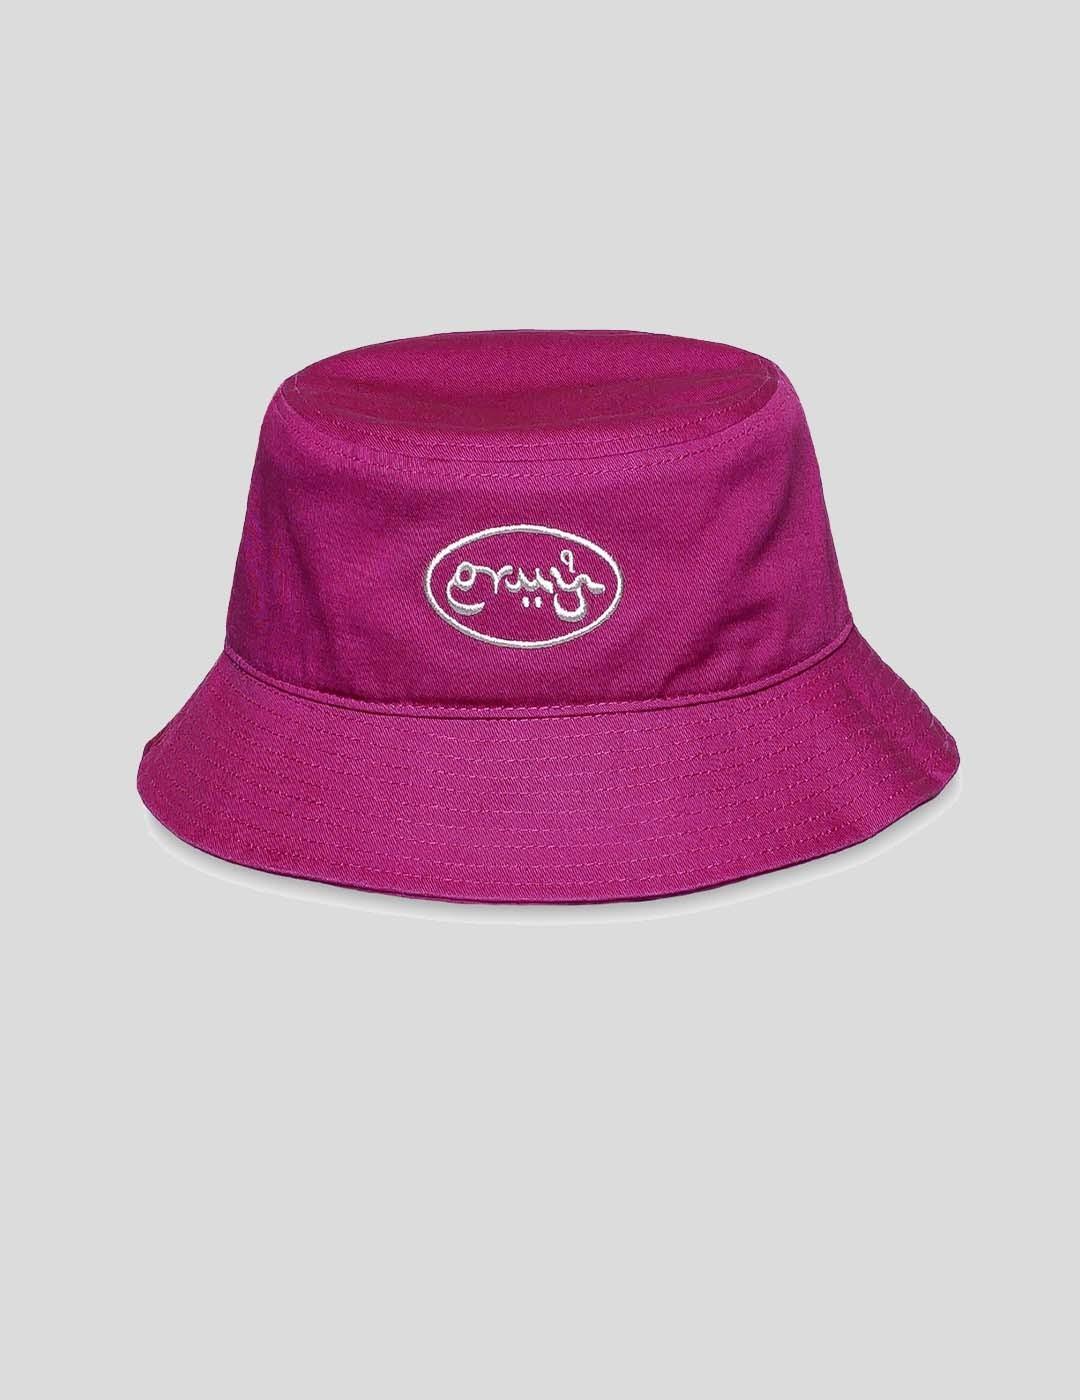 GORRO GRIMEY HOPE UNSEEN BUCKET HAT RED